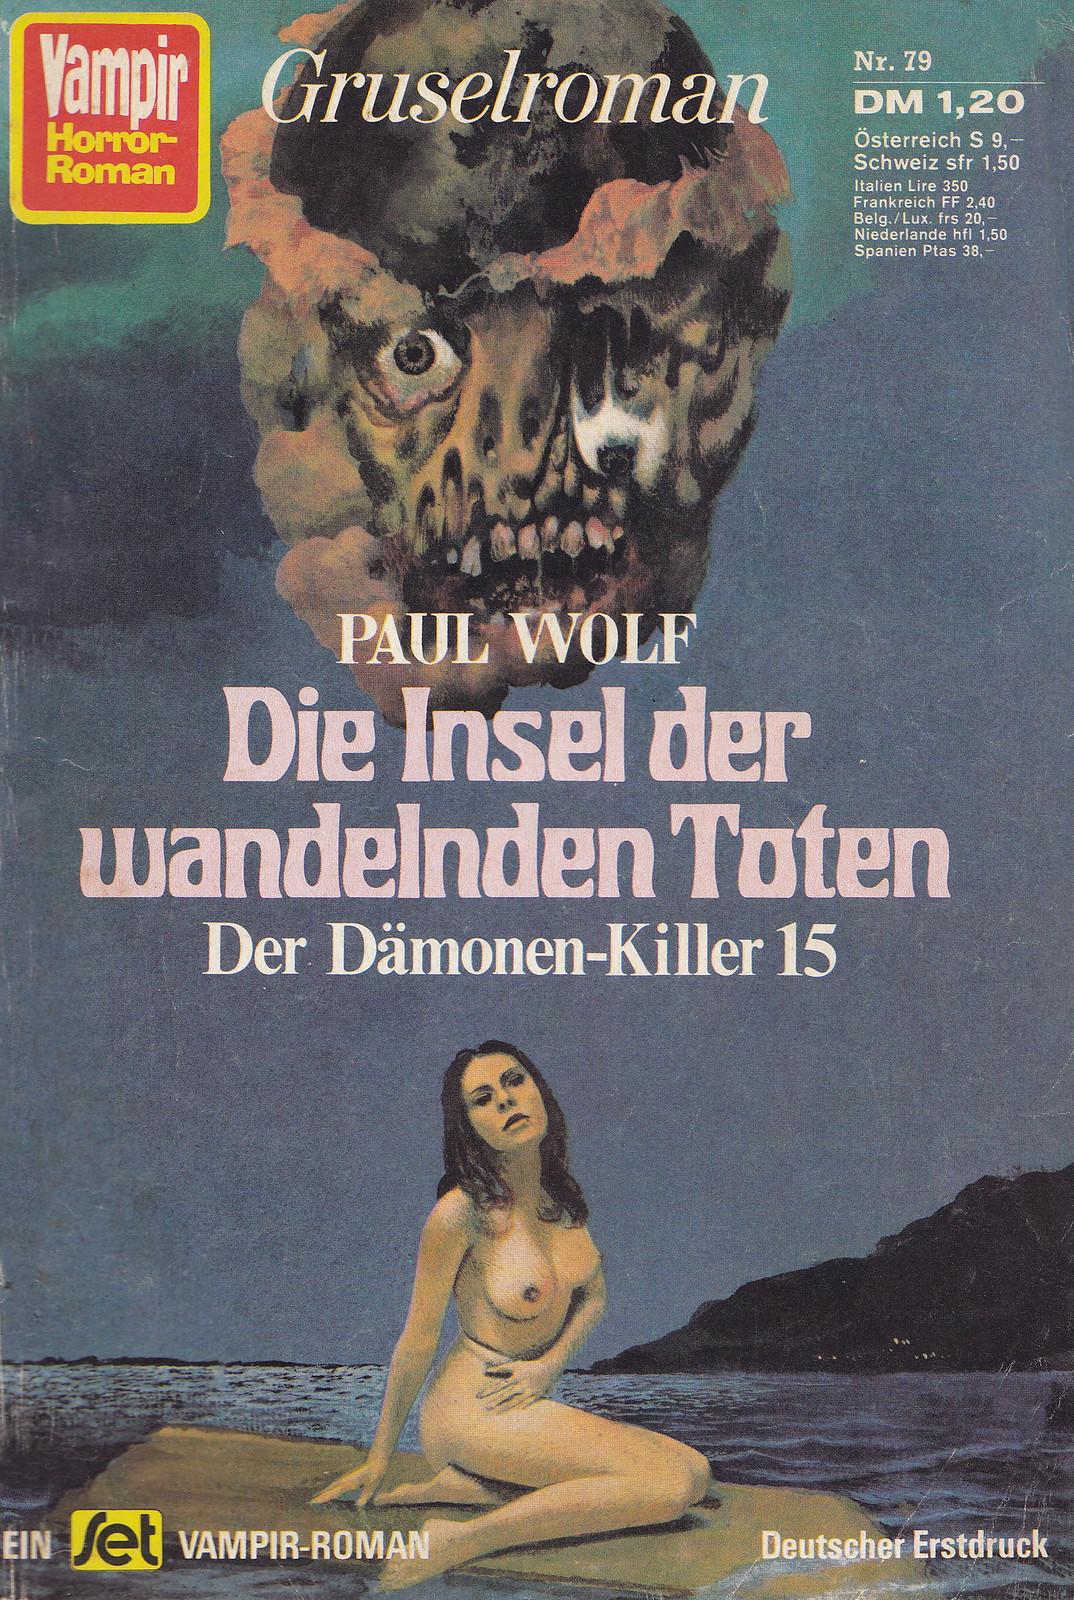 Karel Thole - Vampir Horror Roman - 079